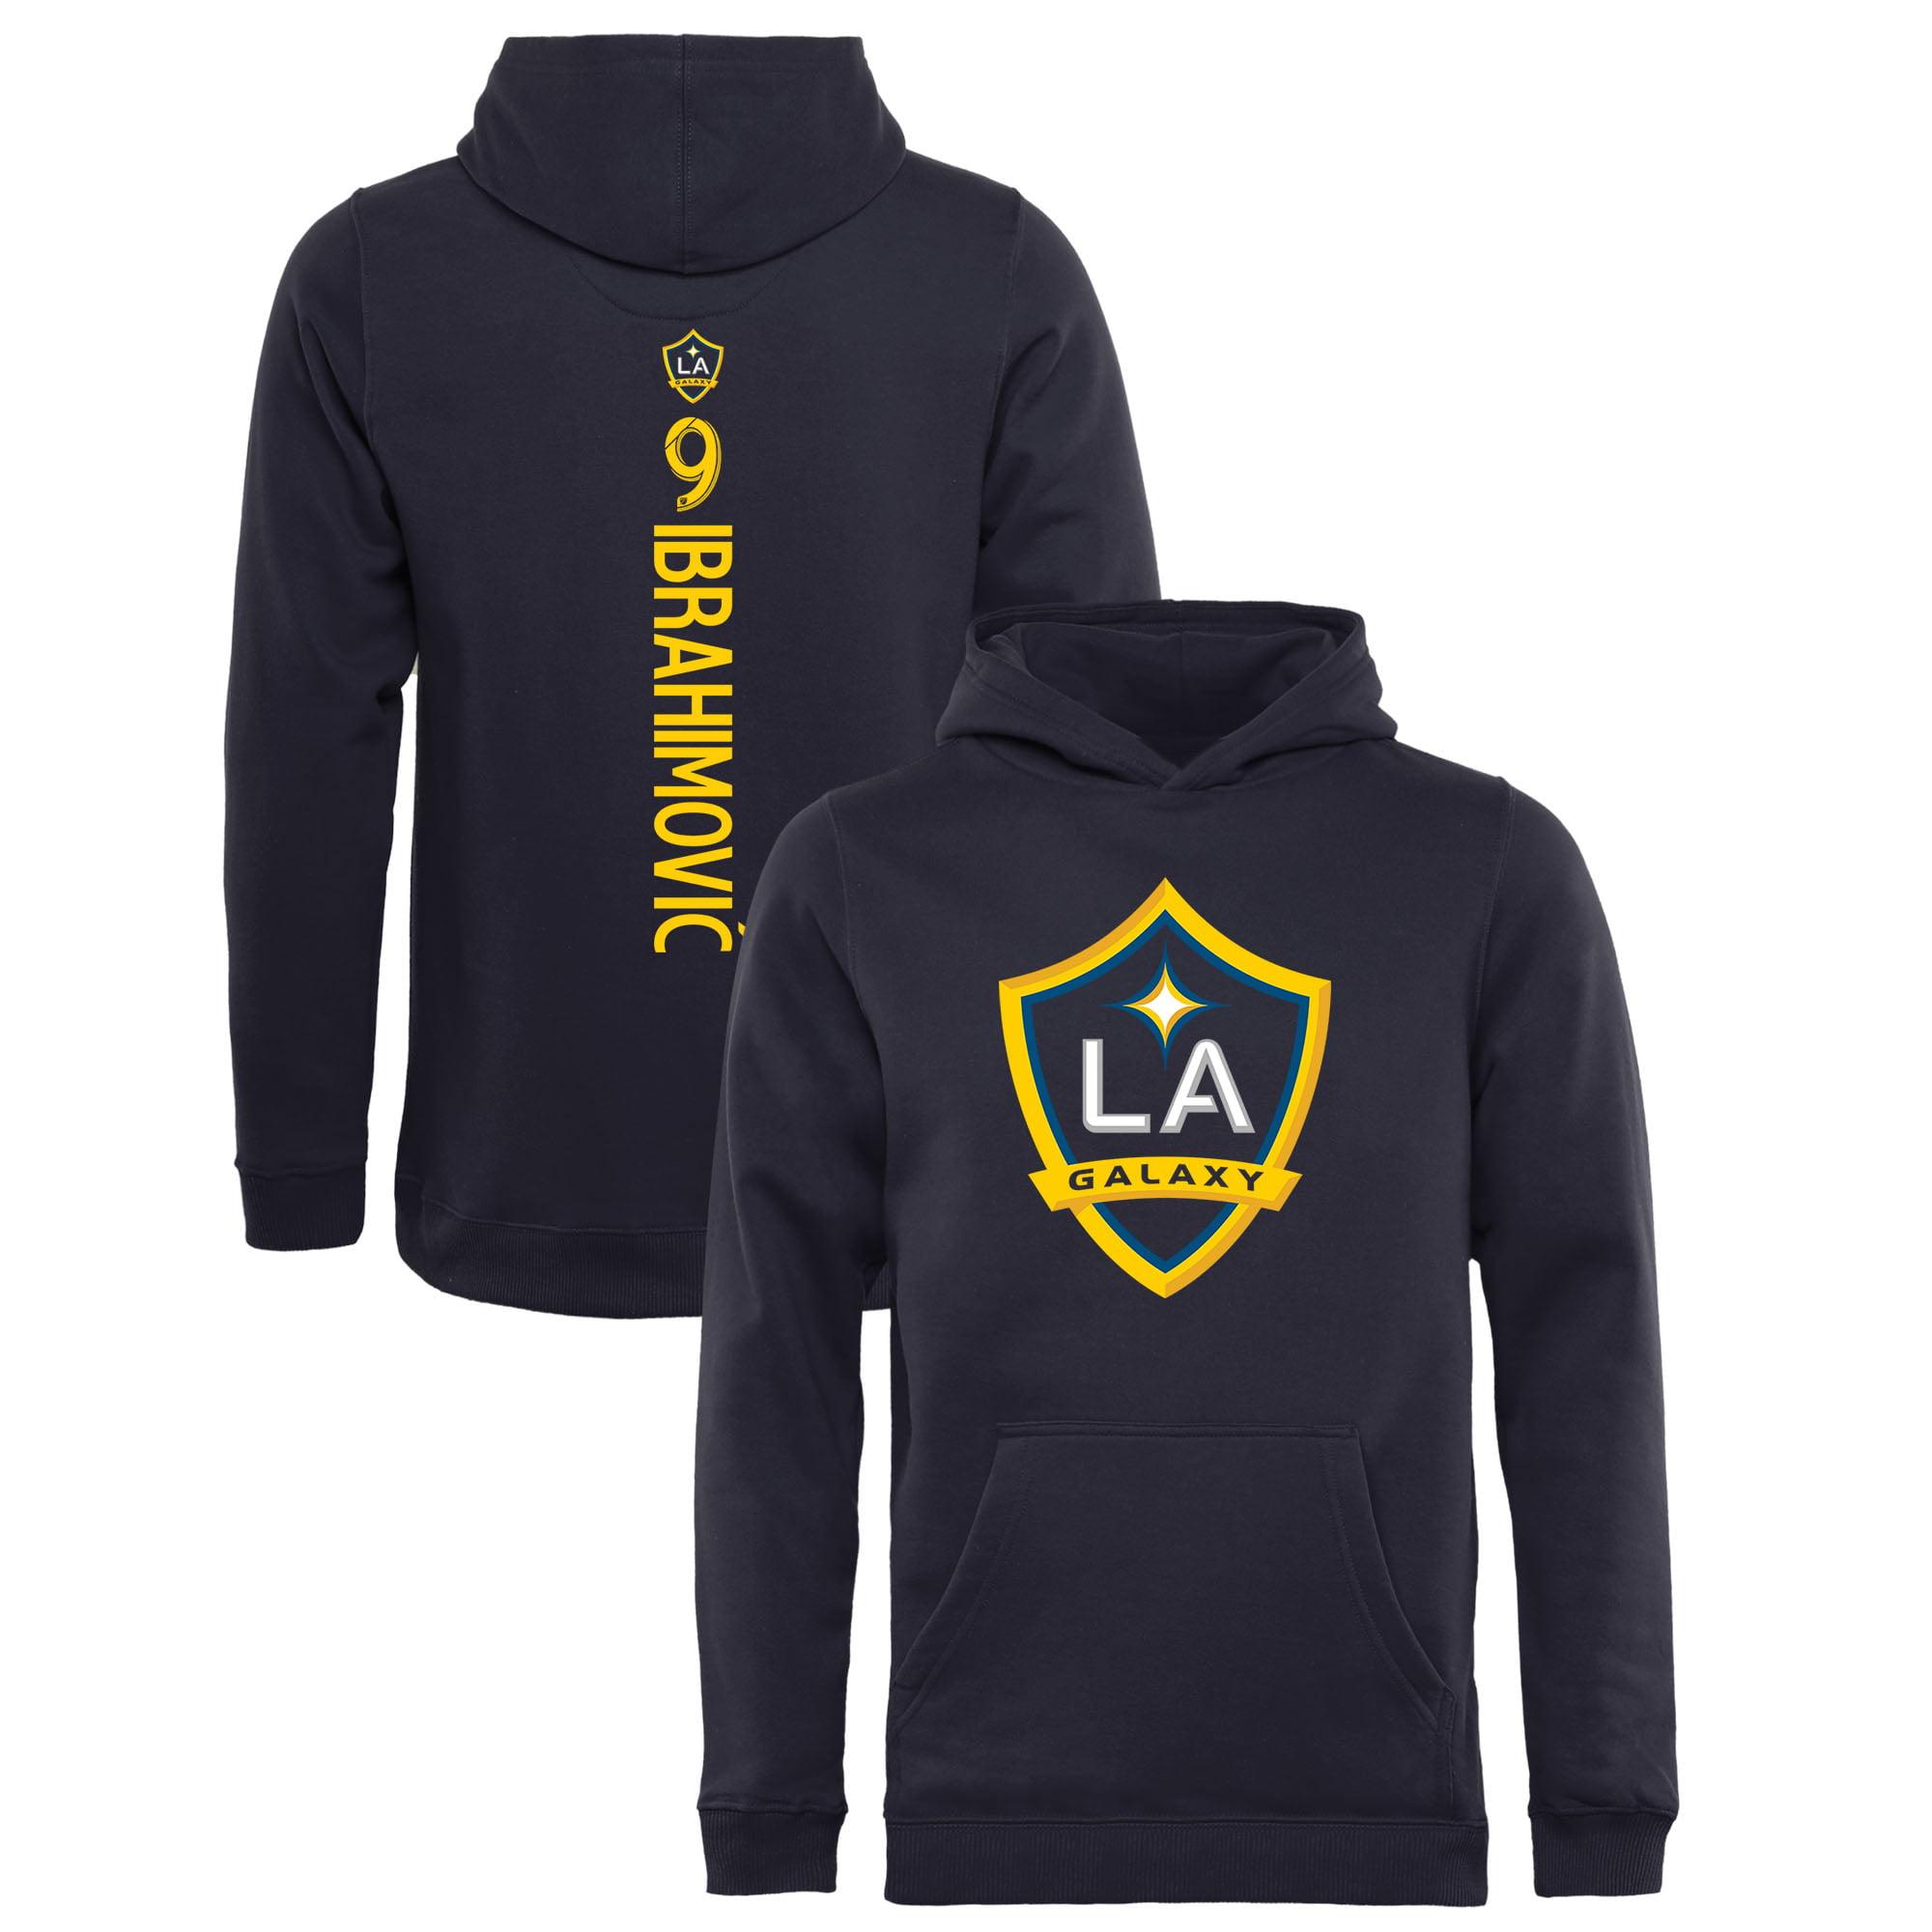 Zlatan Ibrahimovic LA Galaxy Fanatics Branded Youth Backer Name & Number Pullover Hoodie - Navy